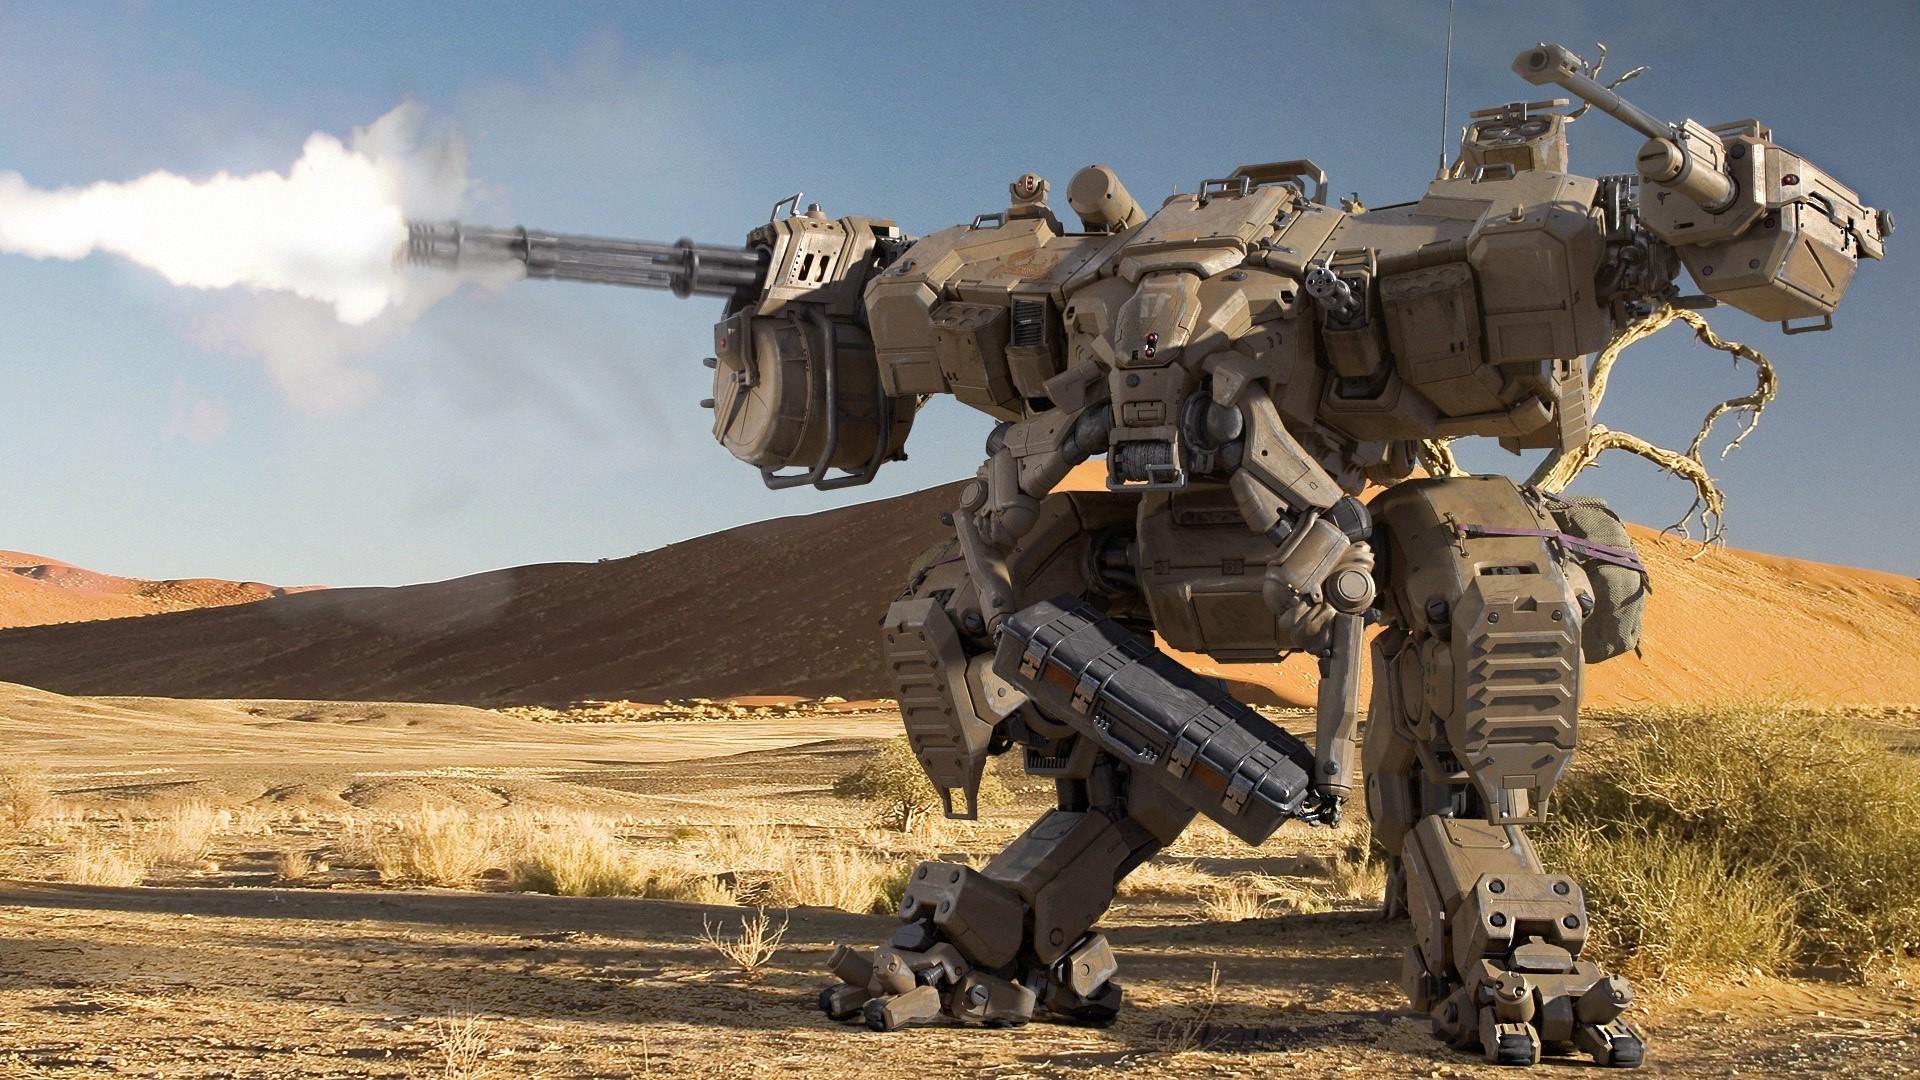 military robots - HD1920×1080